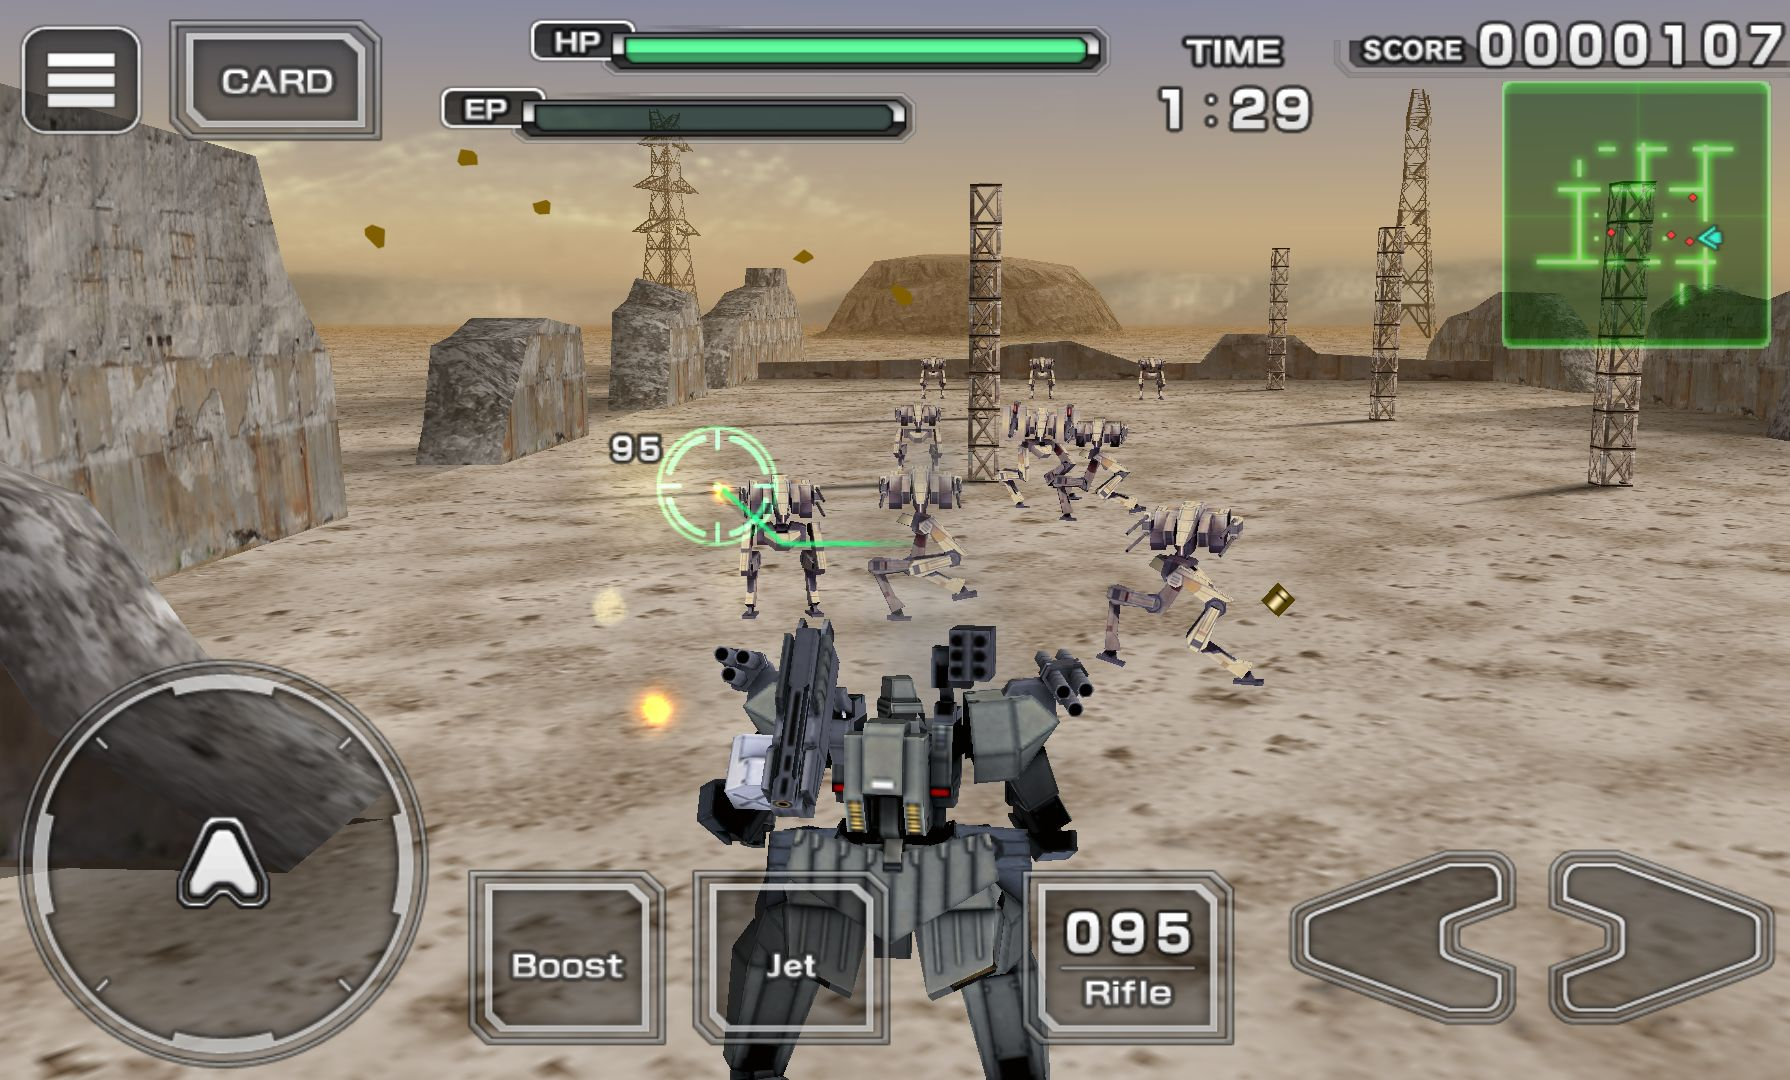 androidアプリ デストロイ・ガンナーズ シグマ(Destroy Gunners Σ)攻略スクリーンショット3